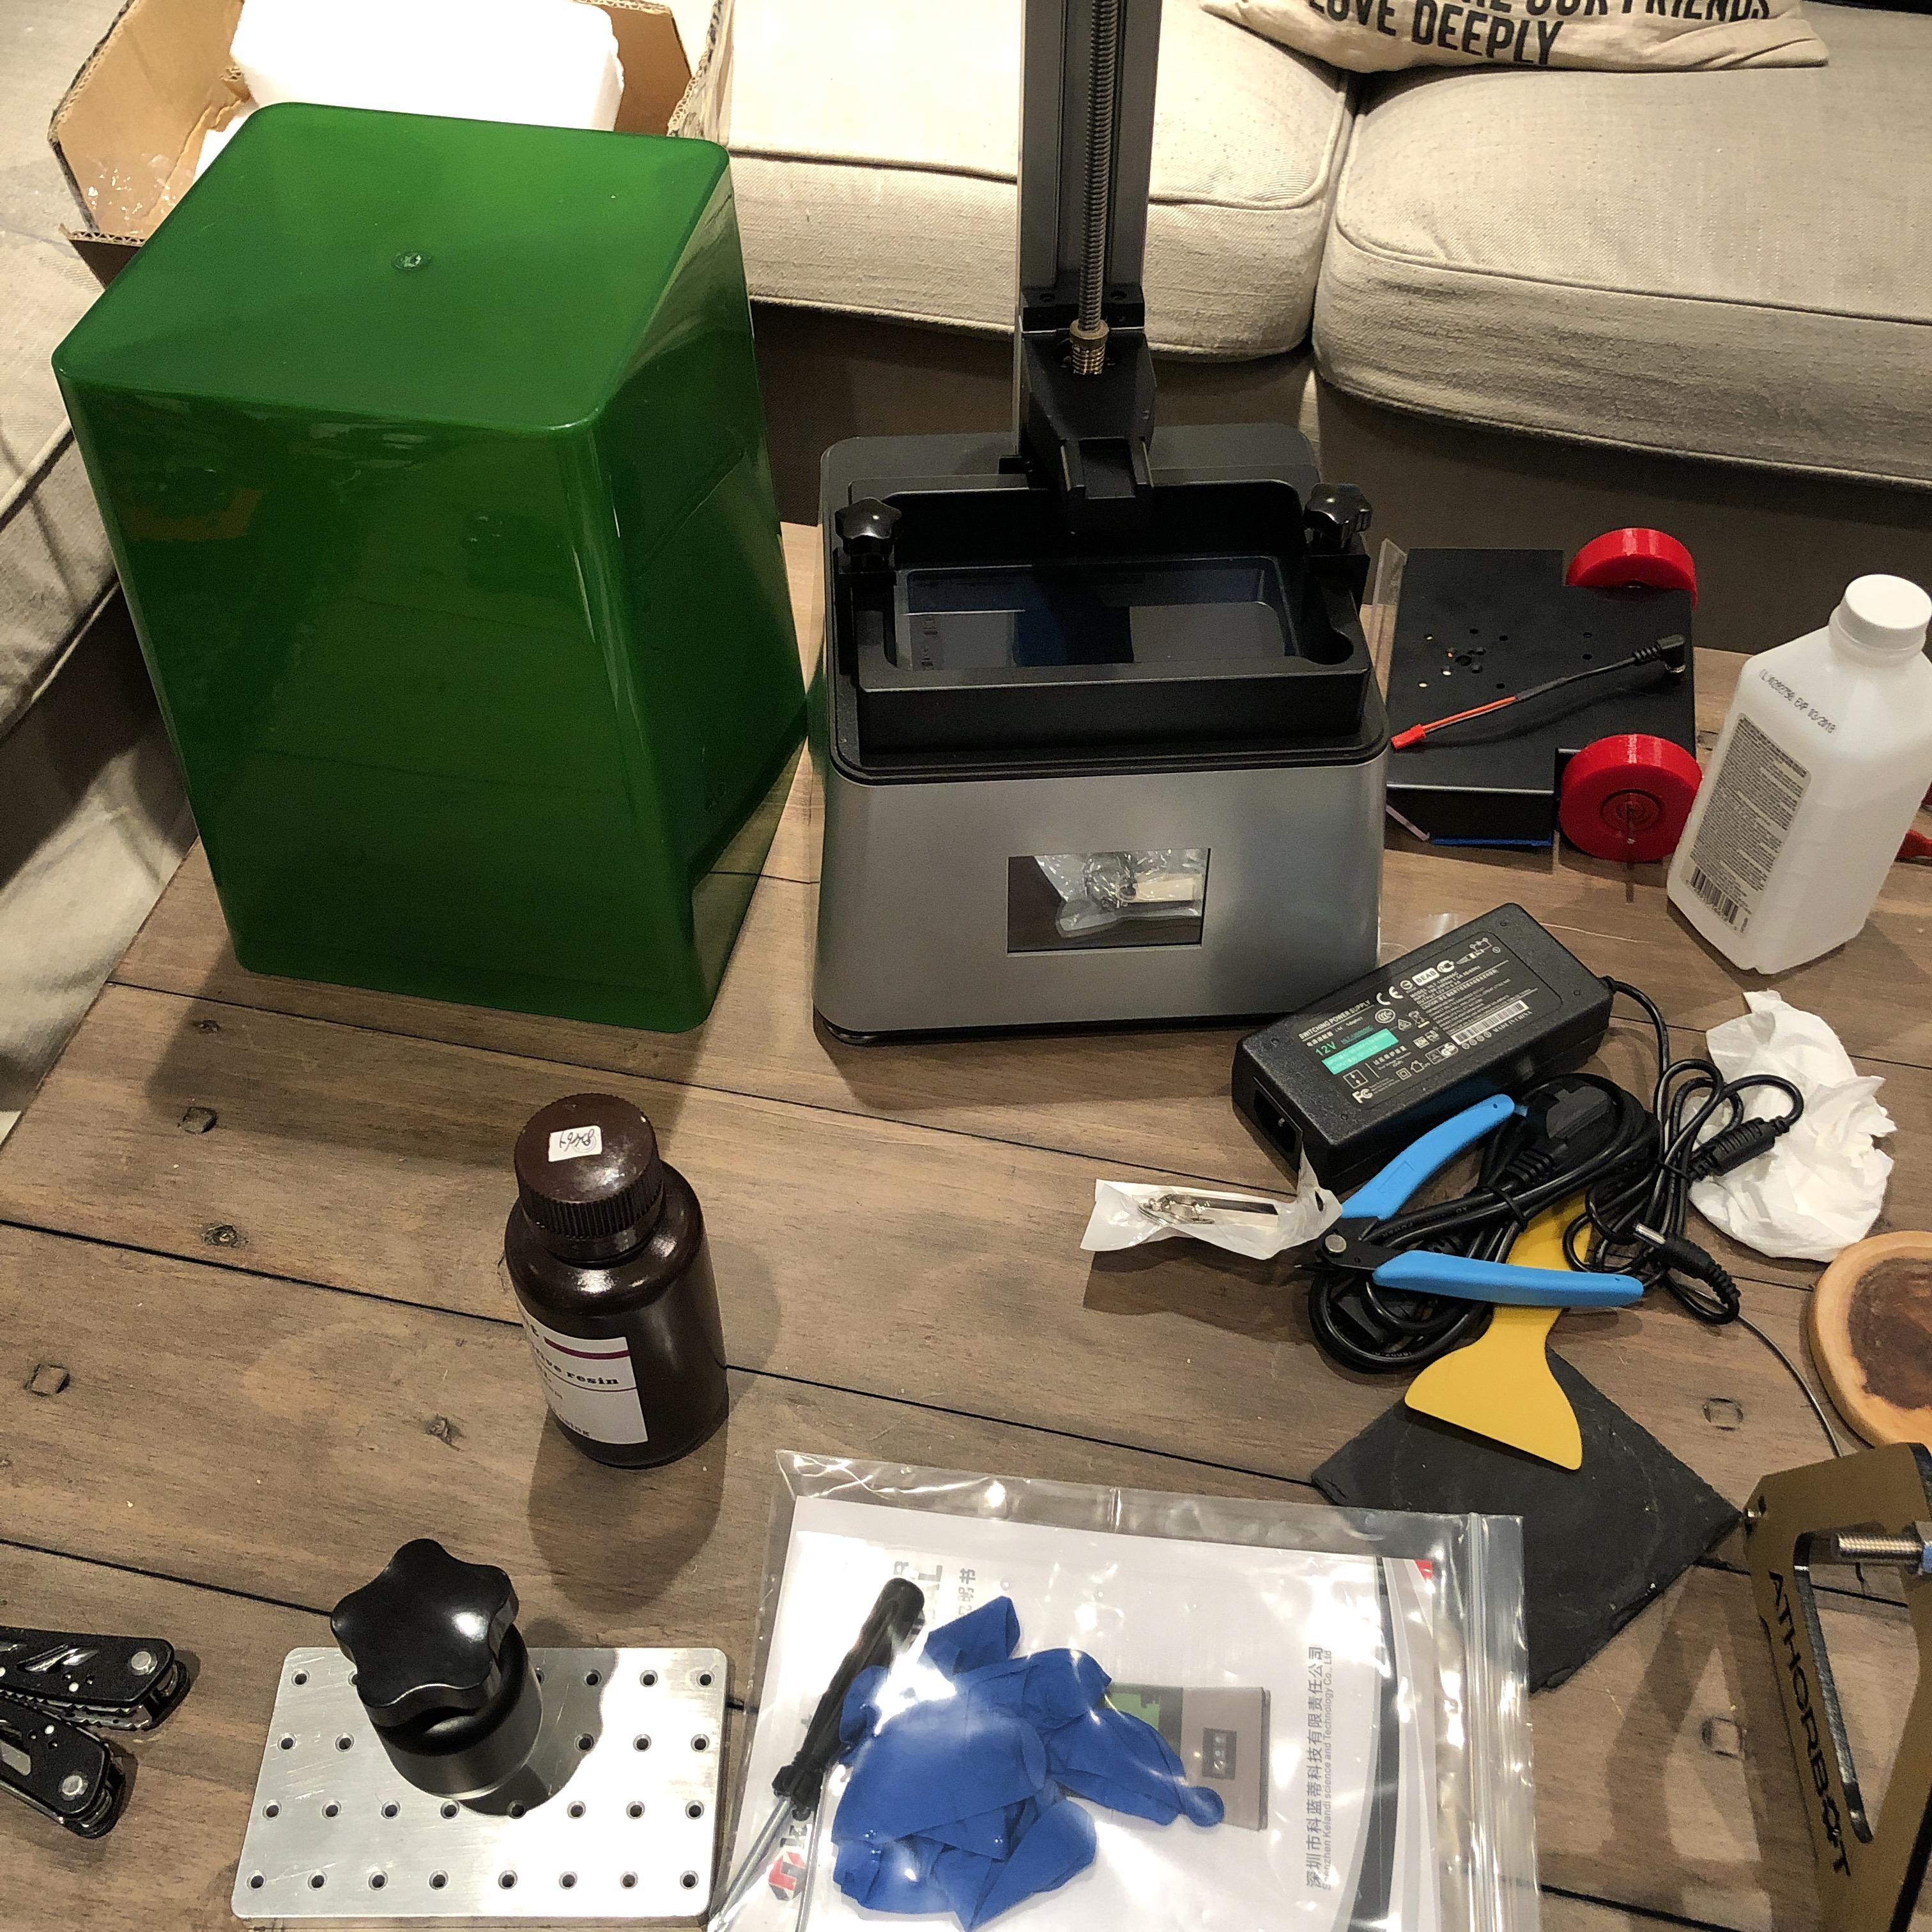 Kelant Orbeat D100 resin print